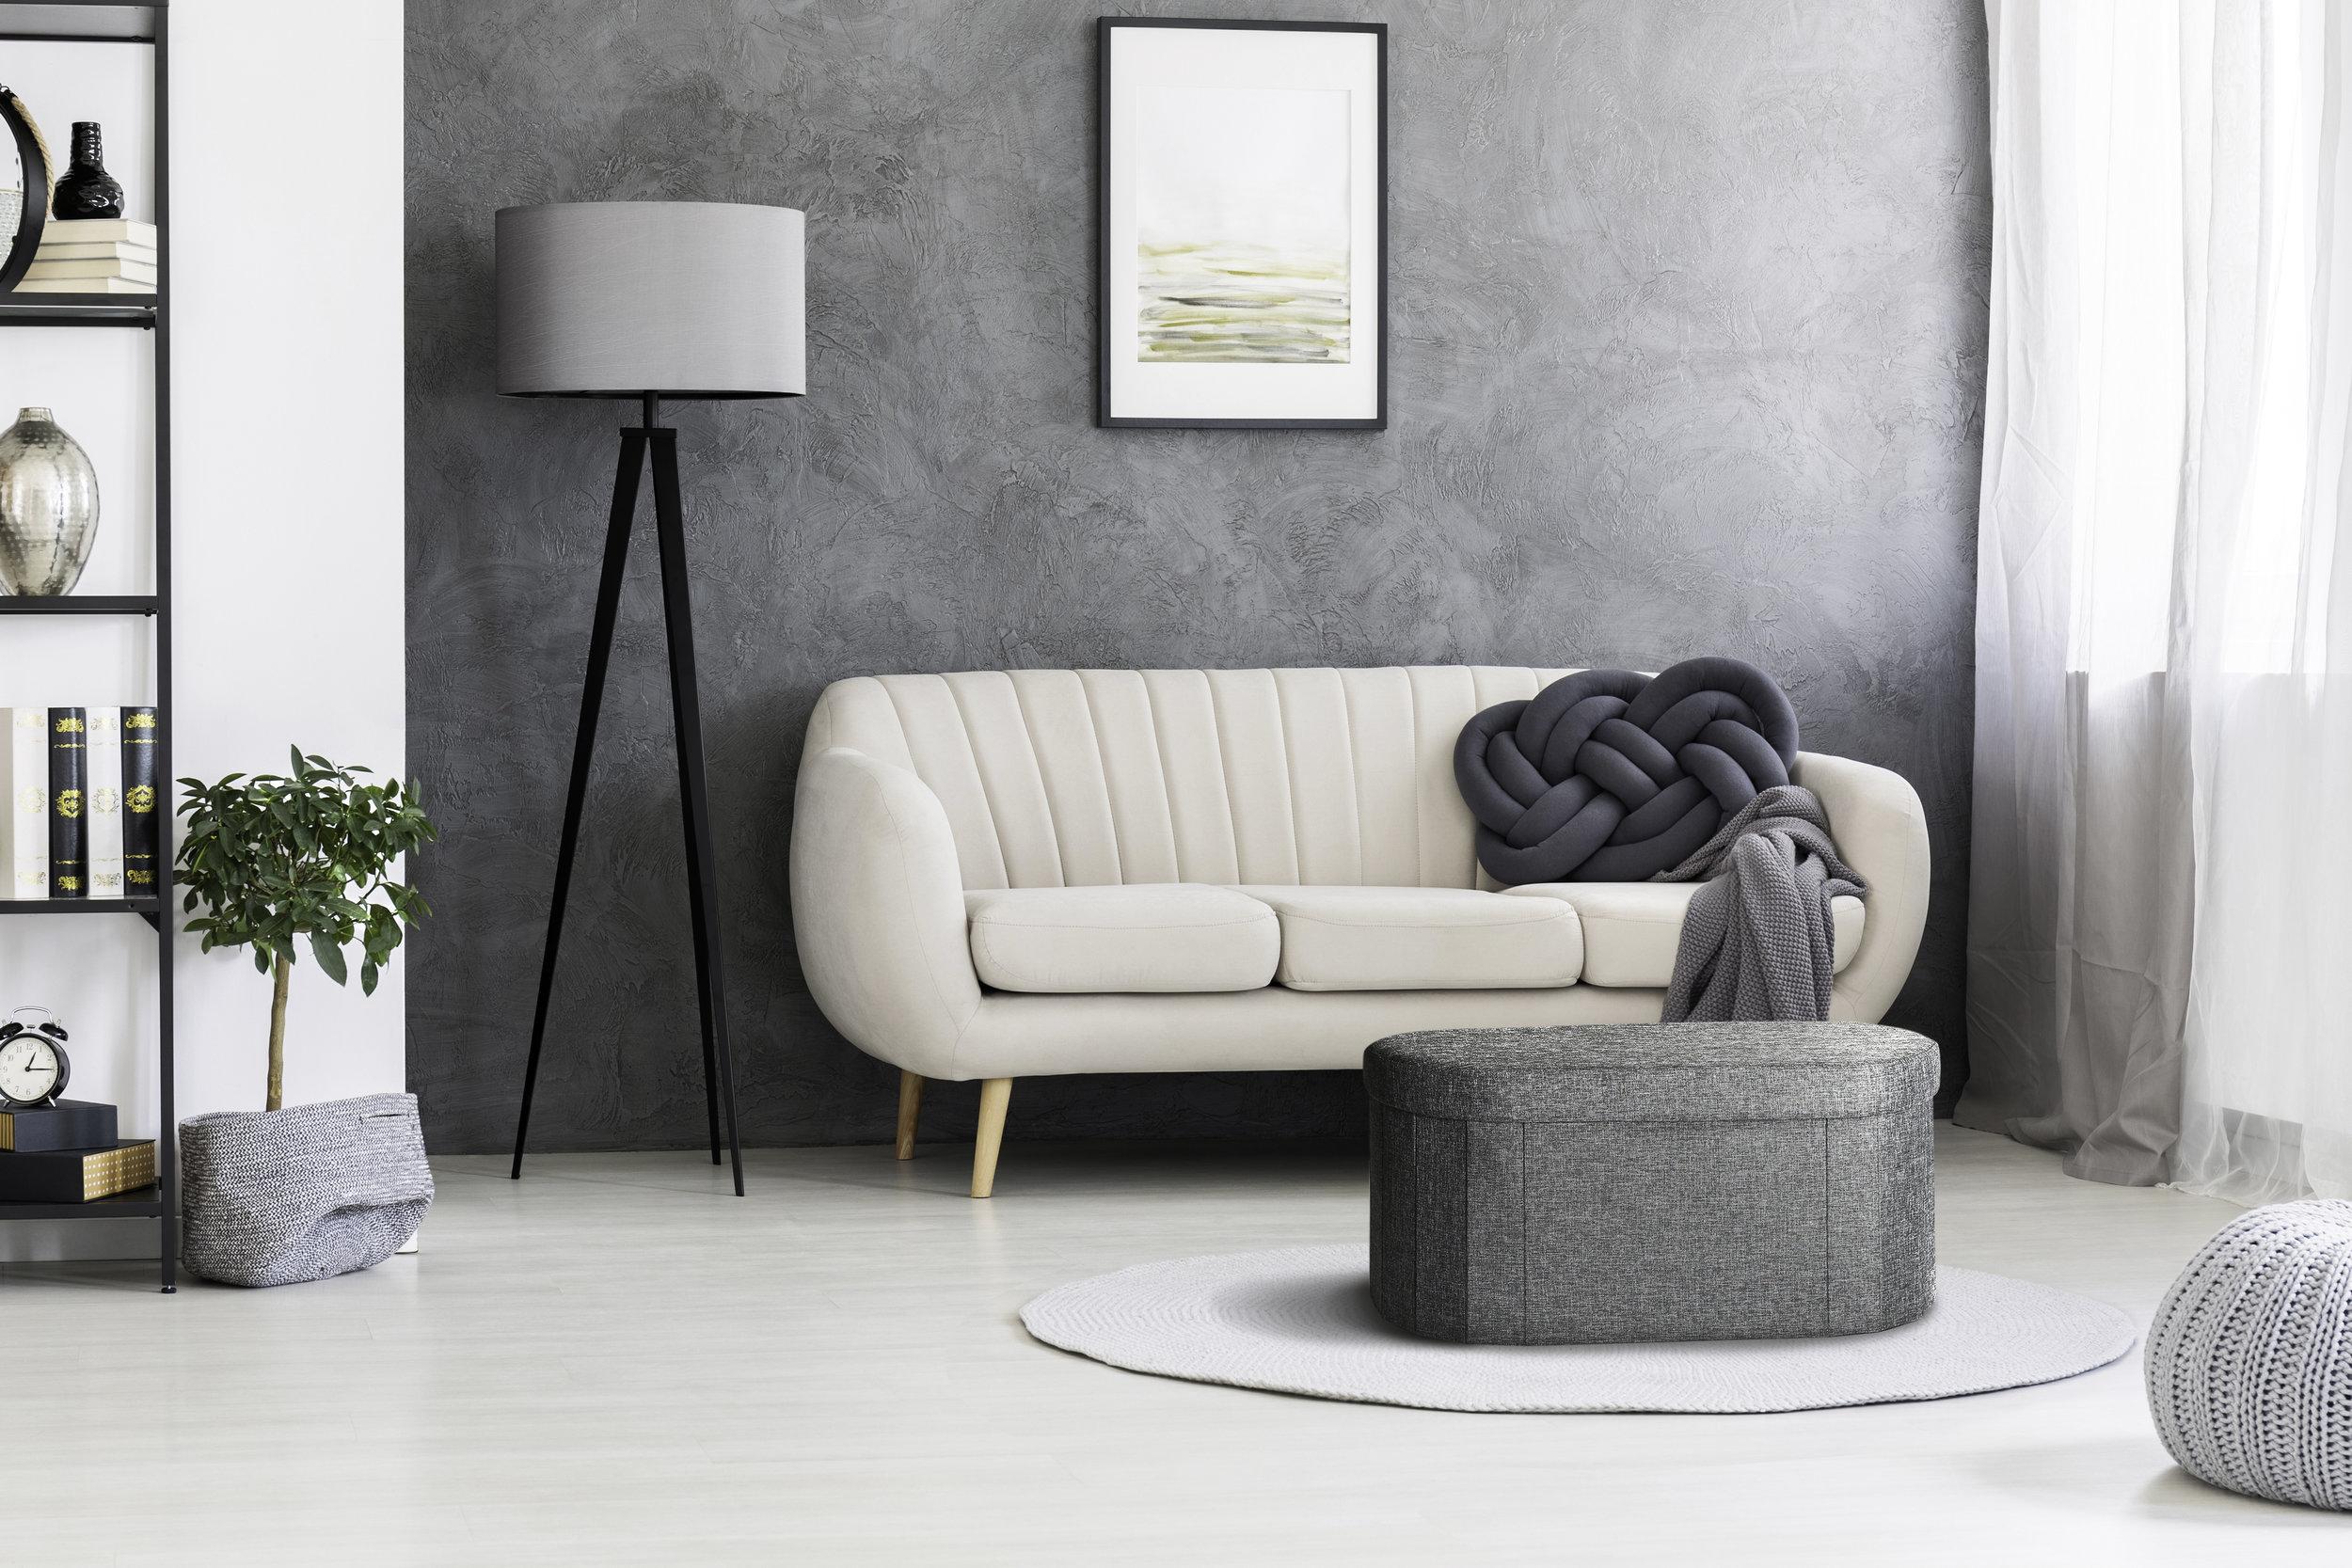 STR00890_ovalottoman_lifestyle_livingroom.jpg